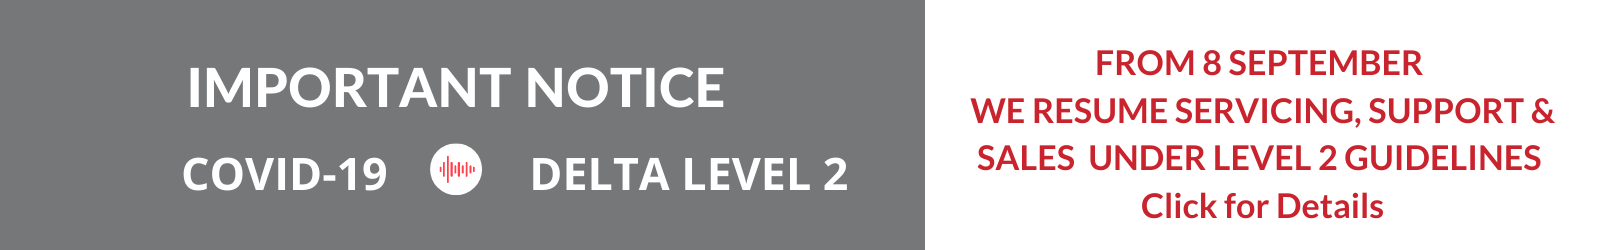 Spray Shop Covid Level 2 Operating Notice